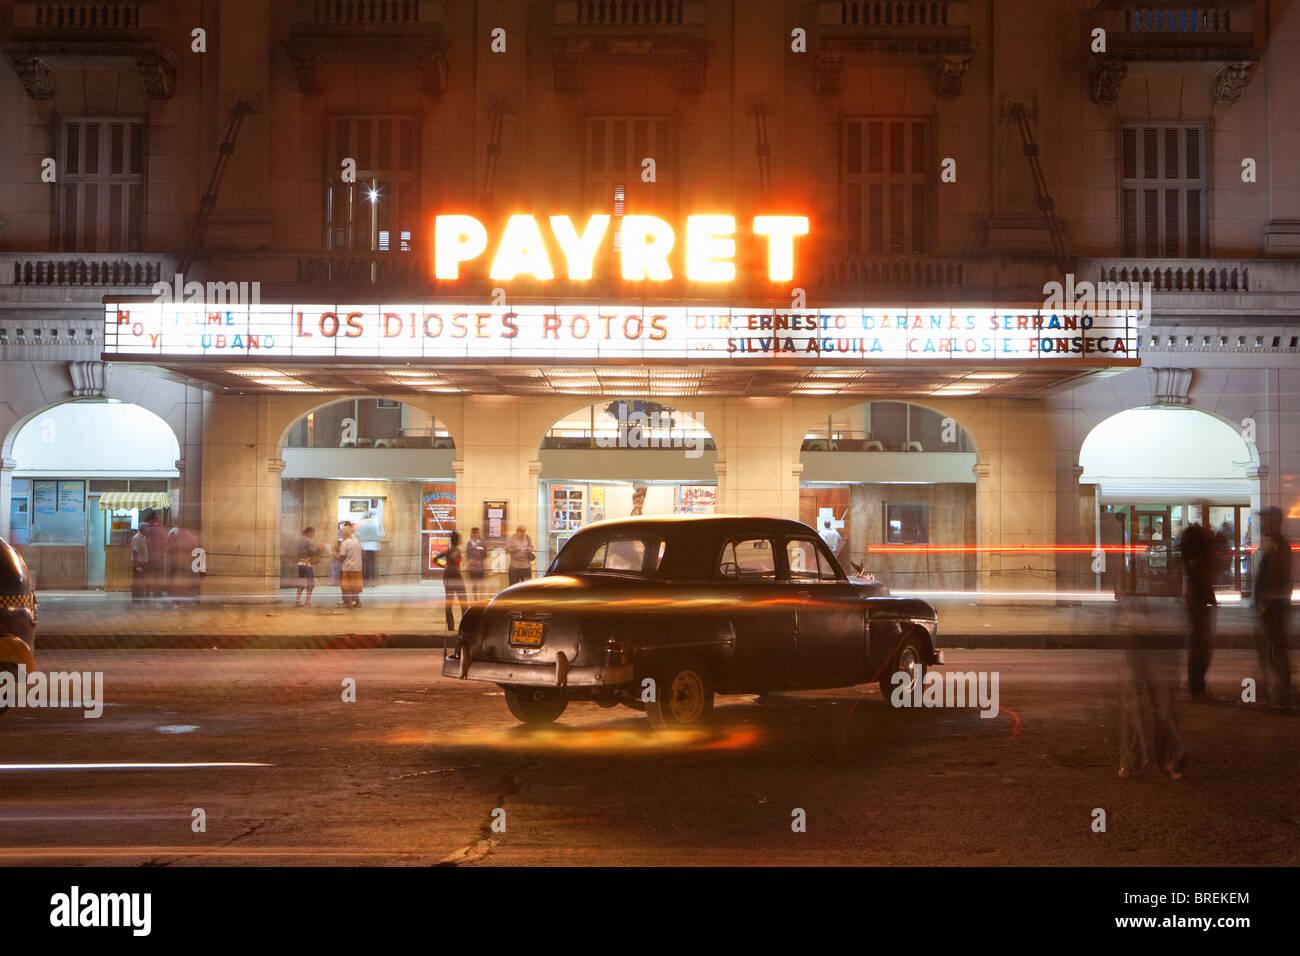 CENTRO HABANA: CINEMA PAYRET Immagini Stock